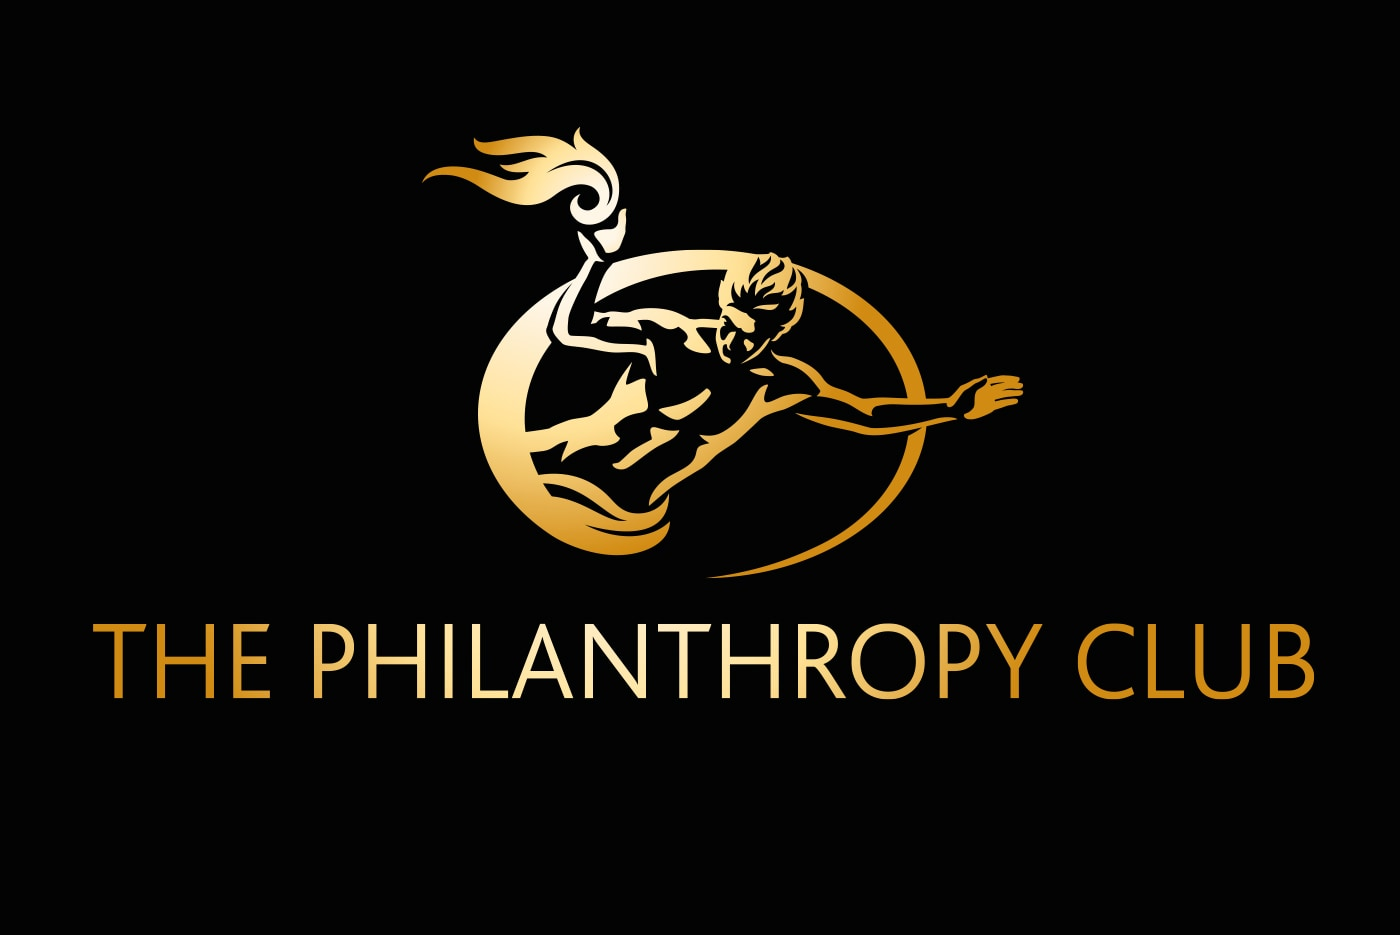 The Philanthropy Club